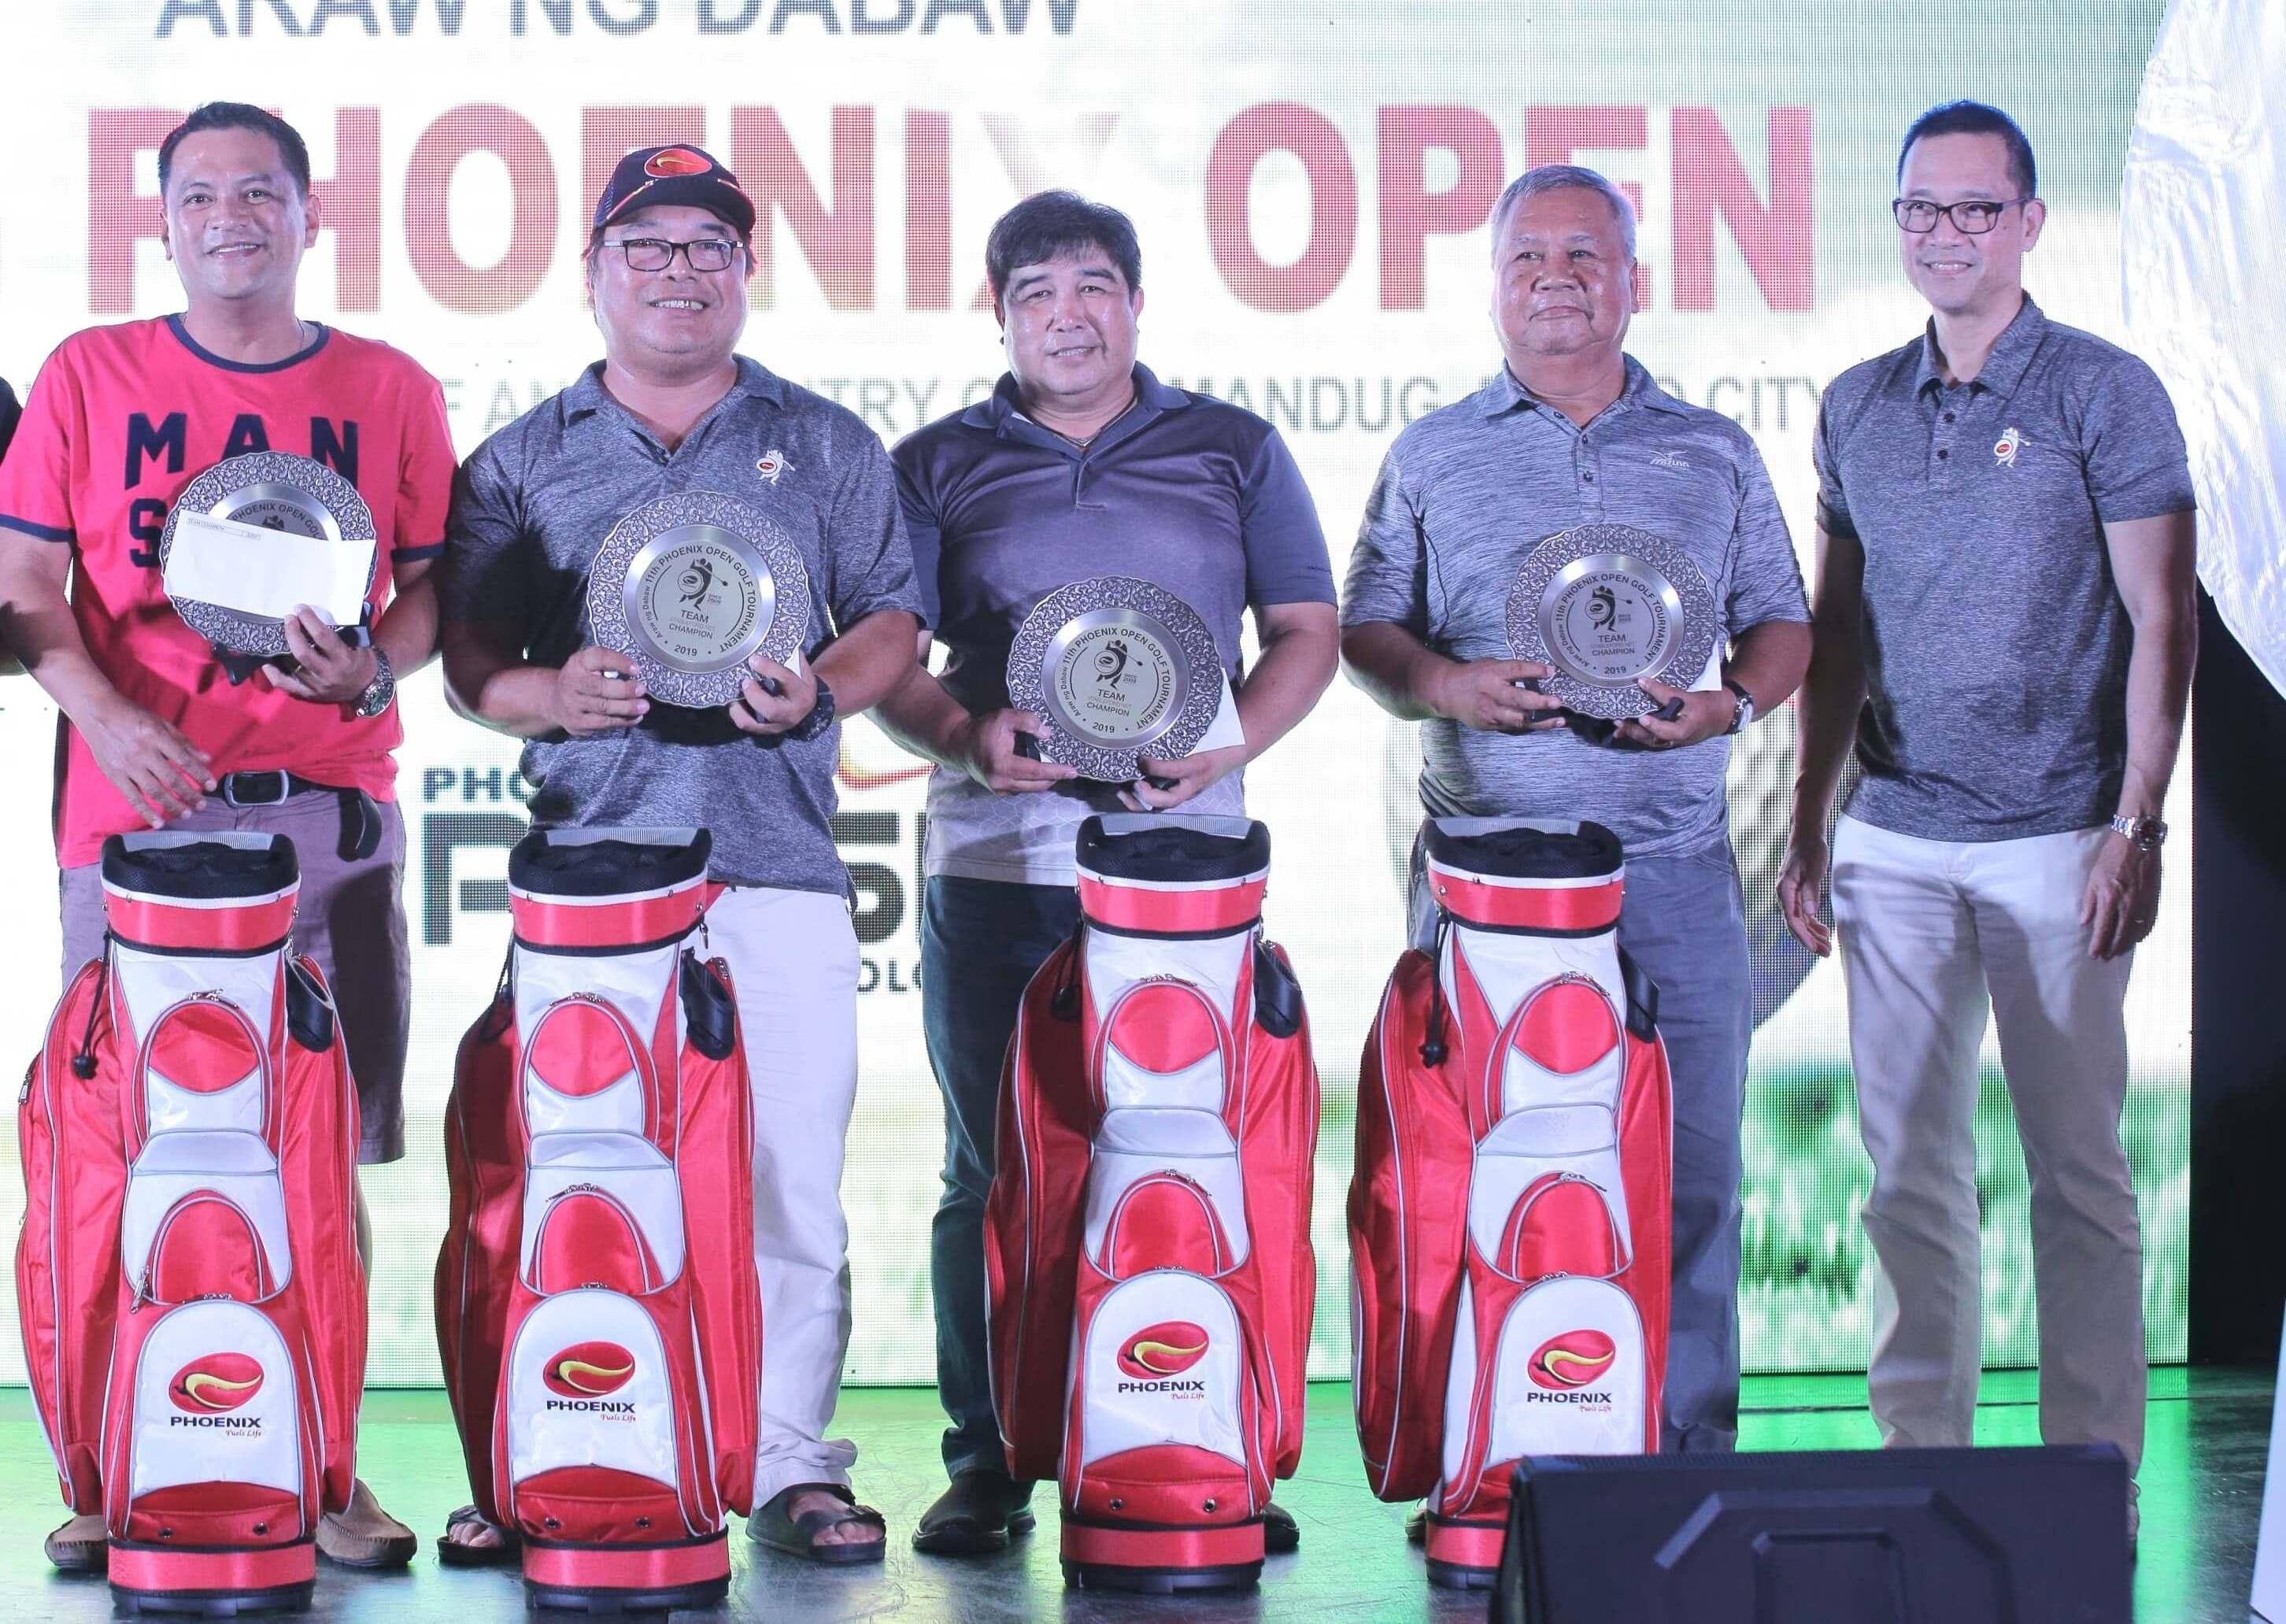 Team Champions of the 11th Phoenix Open